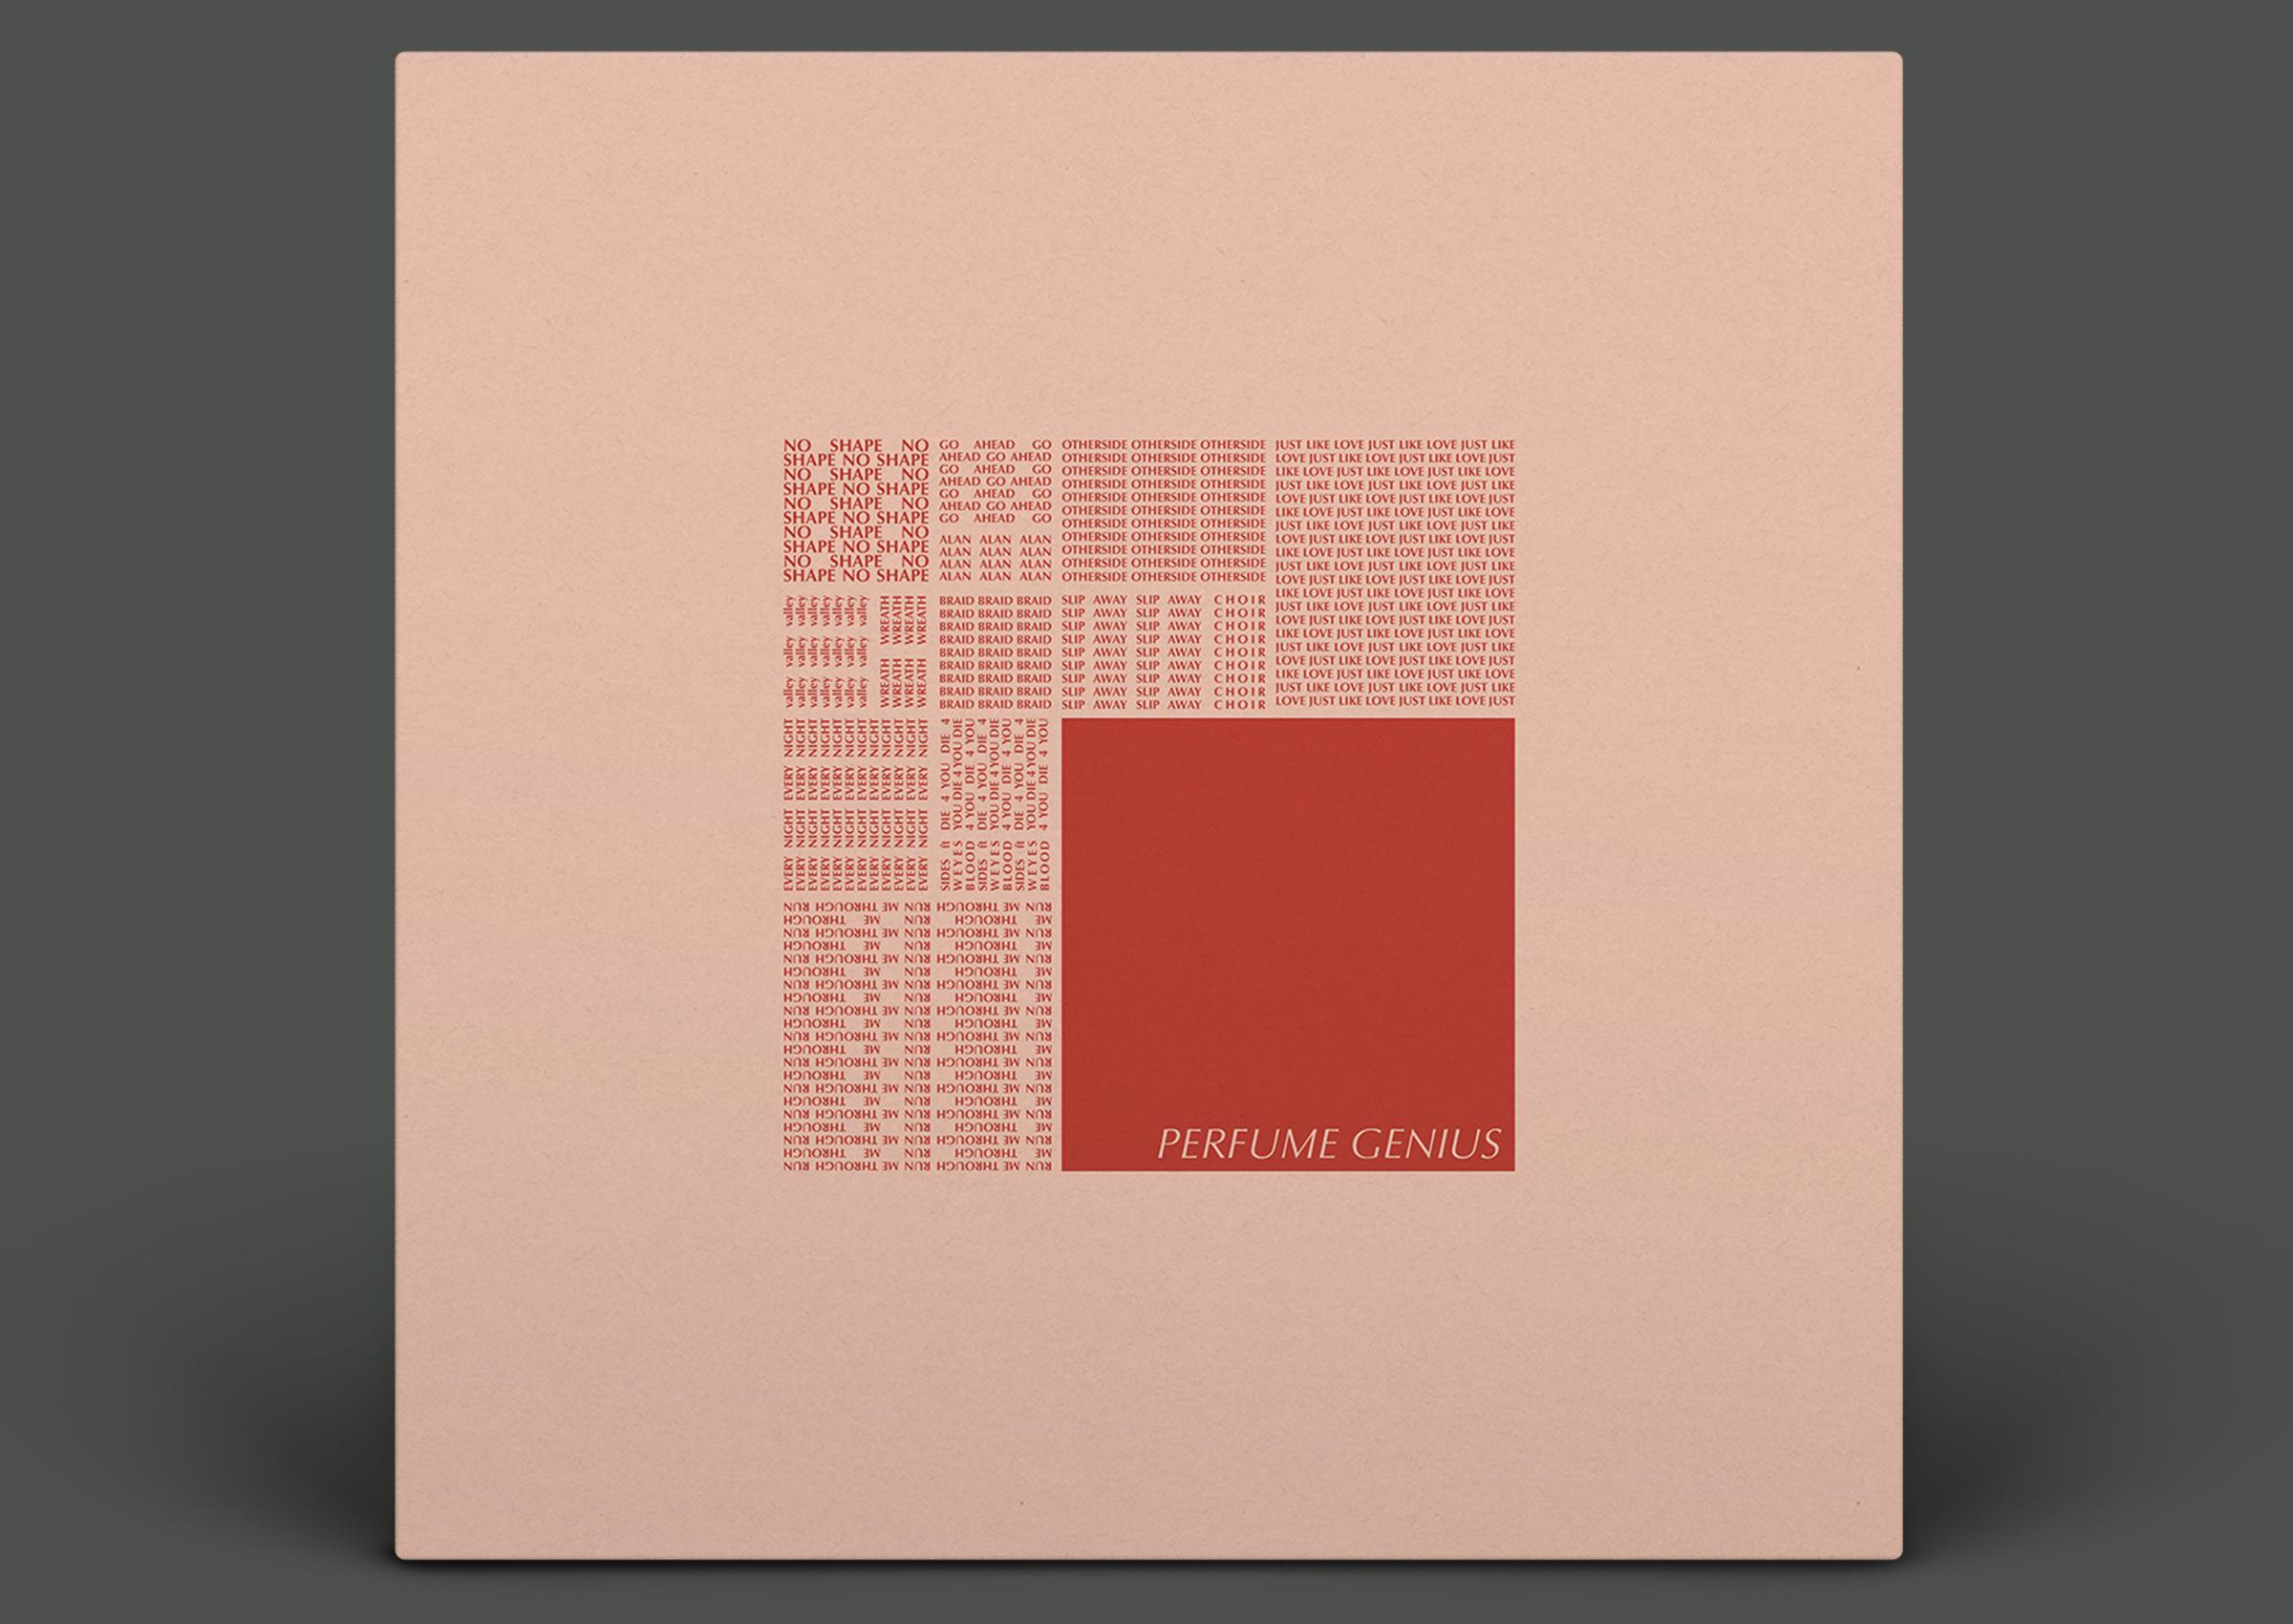 perfume-genius-vinyl-closeup.png